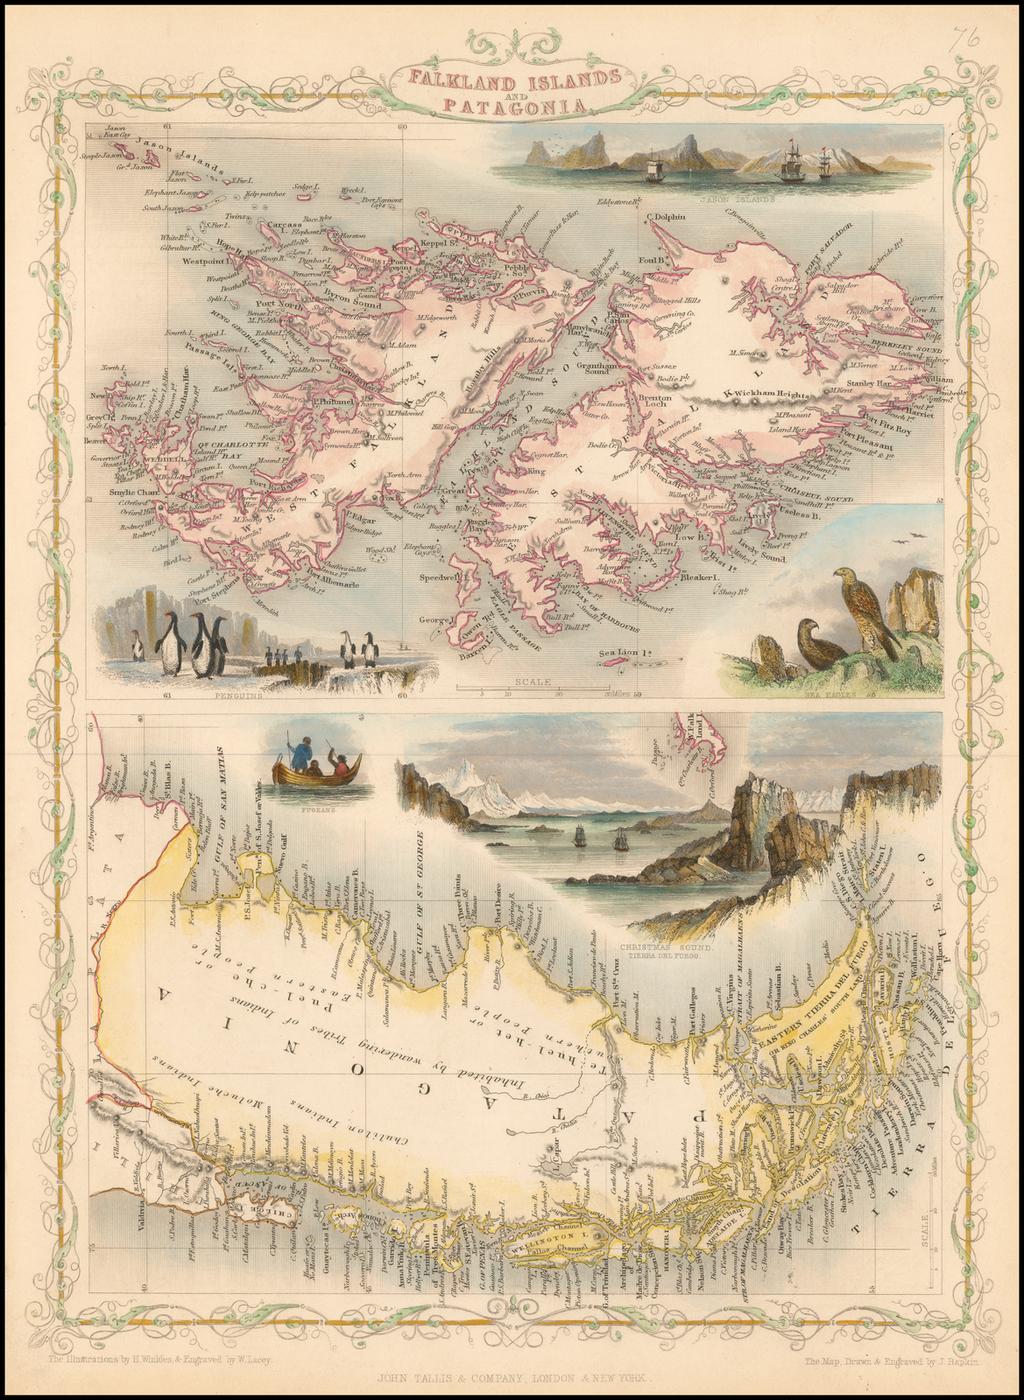 Falkland Islands and Patagonia By John Tallis